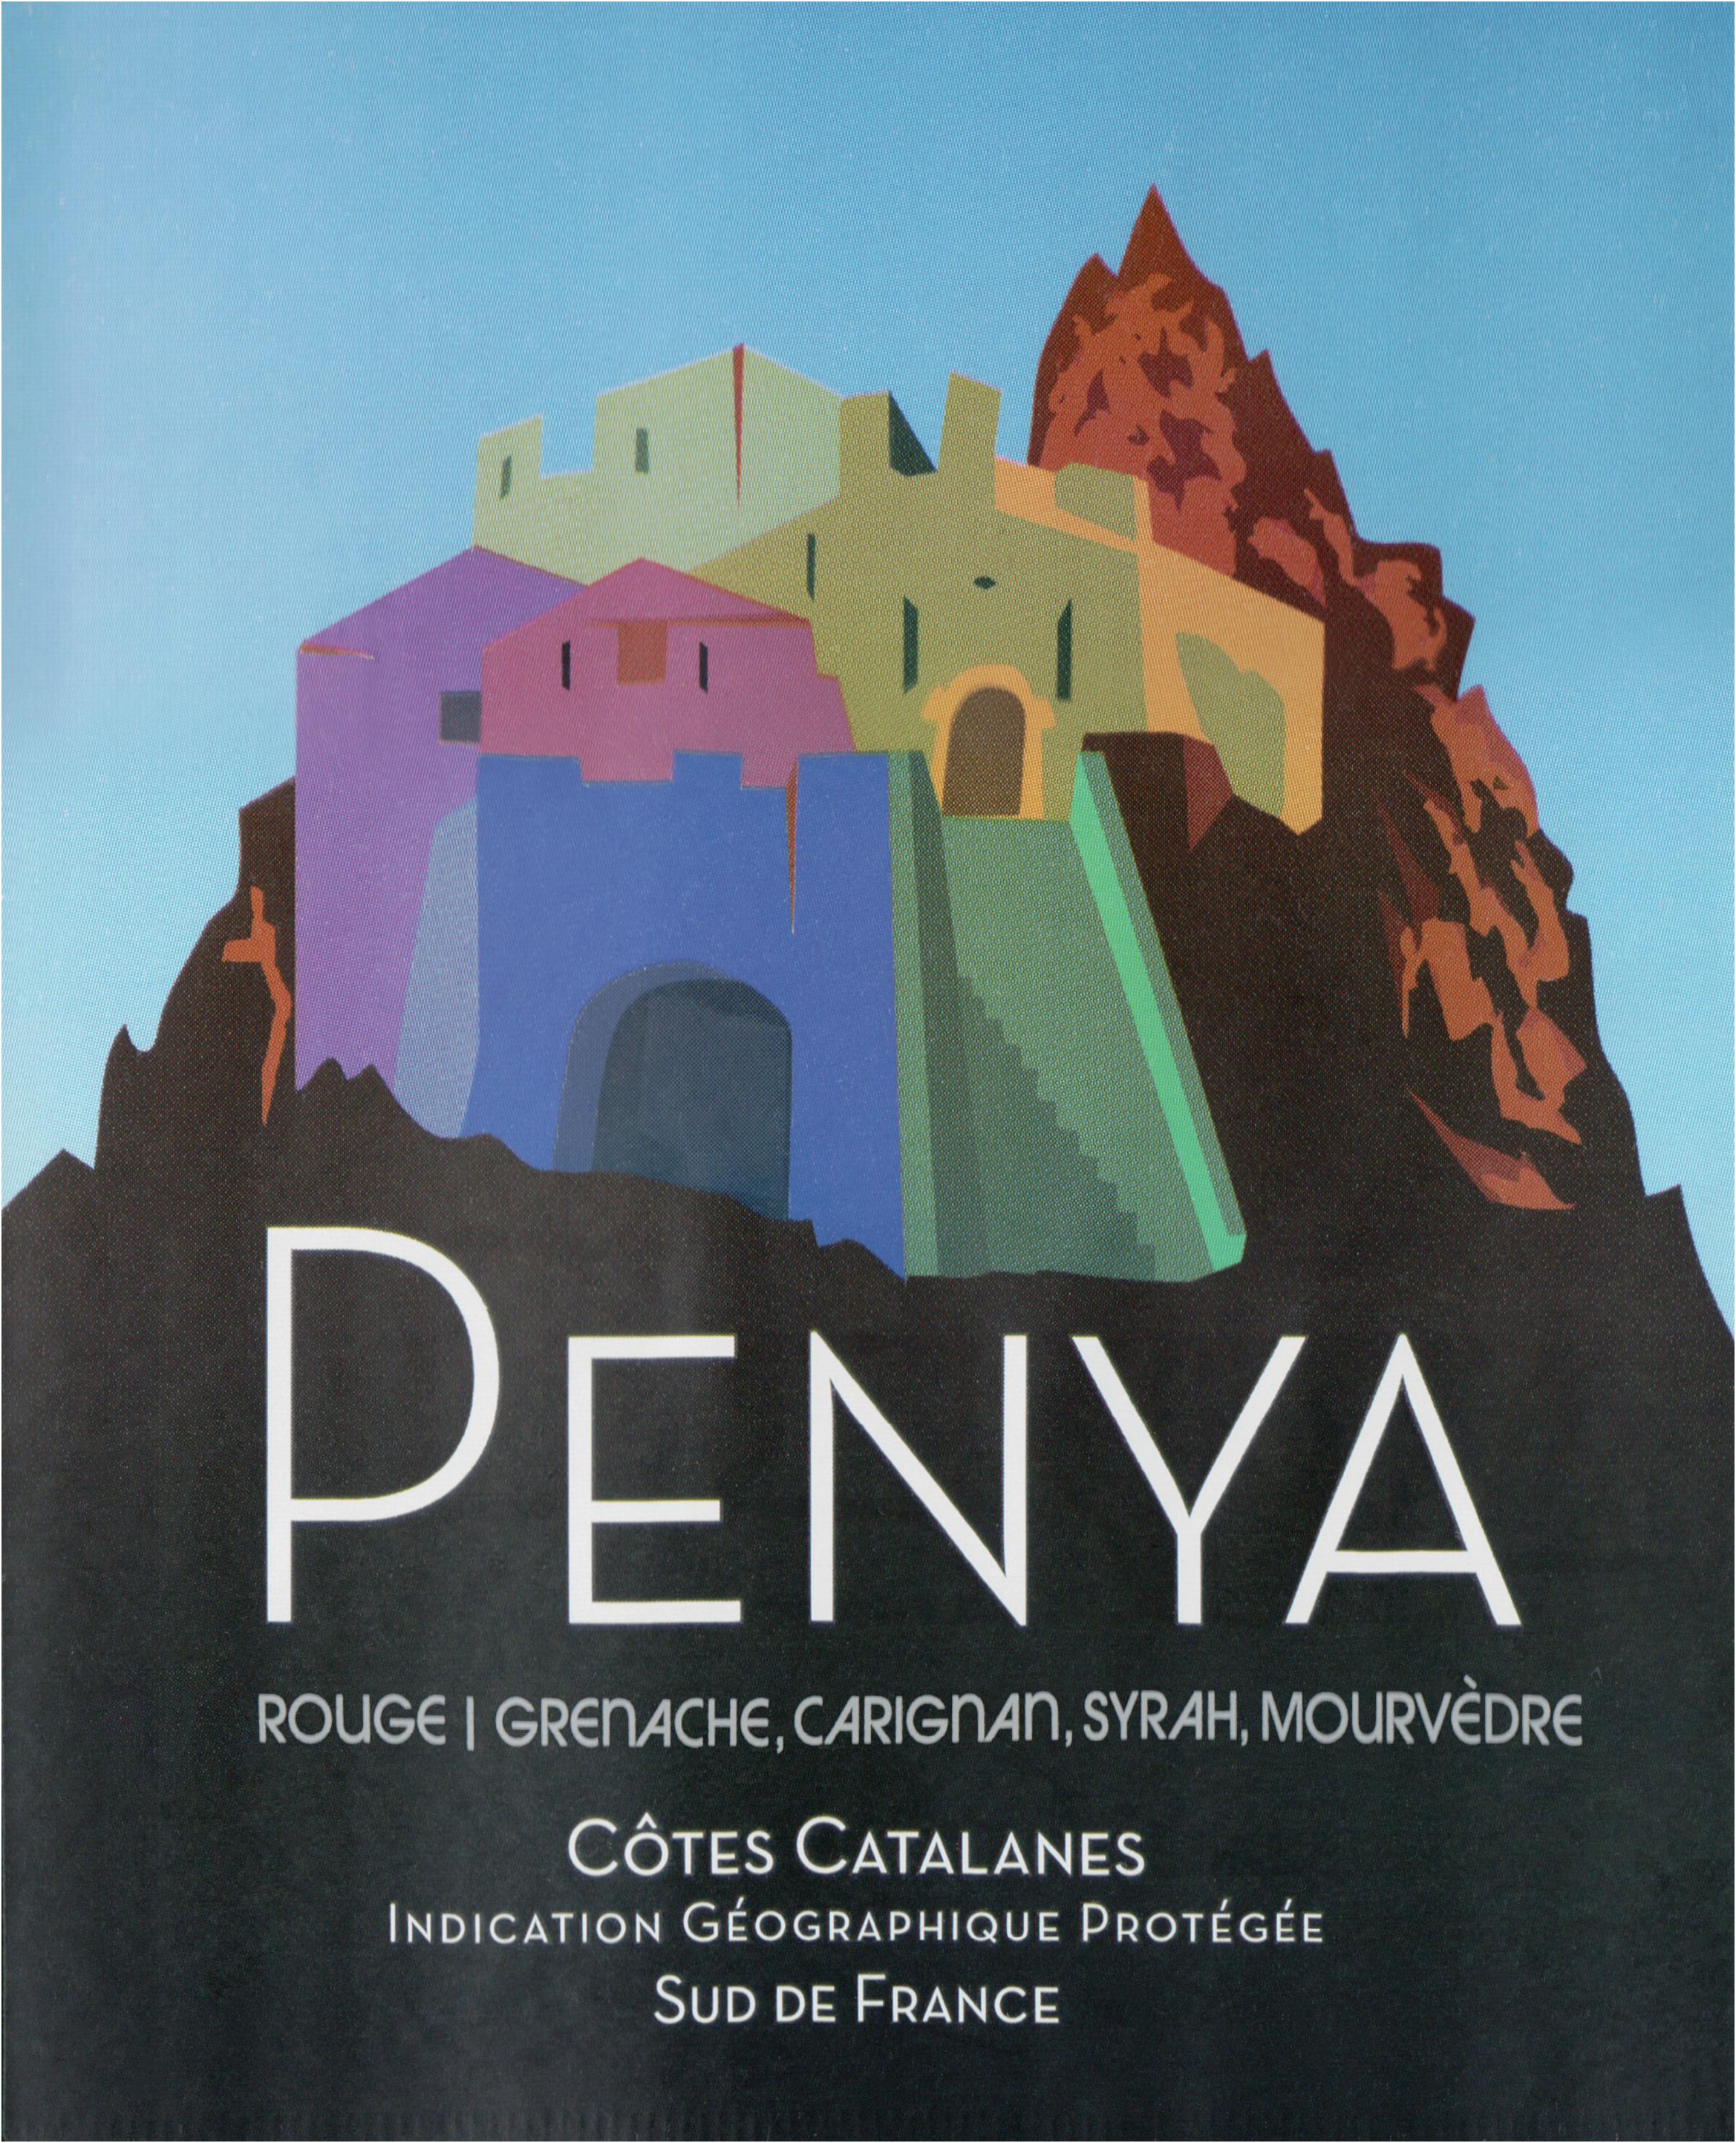 Penya Cotes Catalanes Rouge 2019